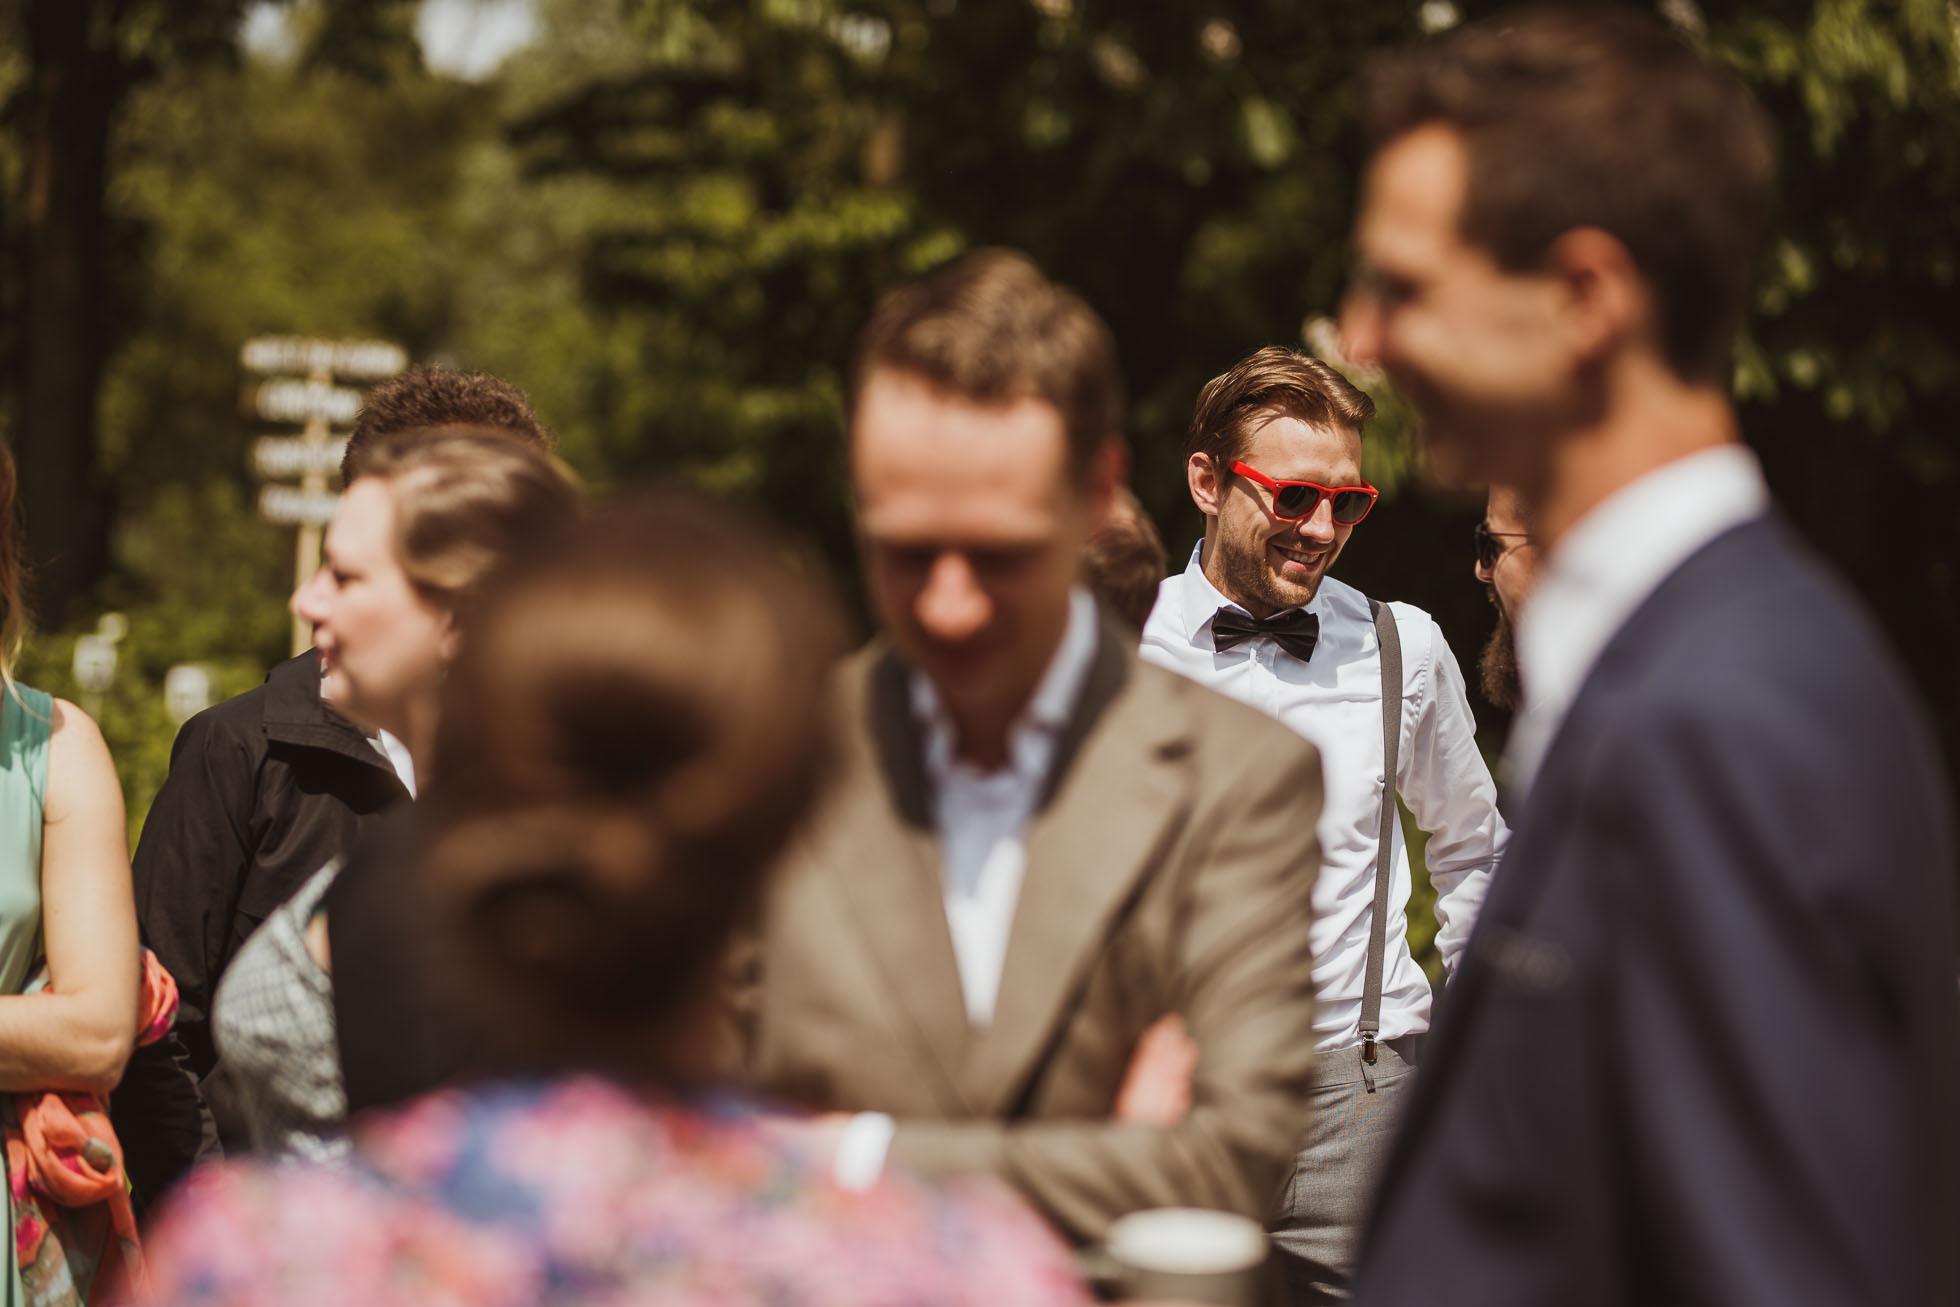 utrecht-wedding-photographer-61.jpg